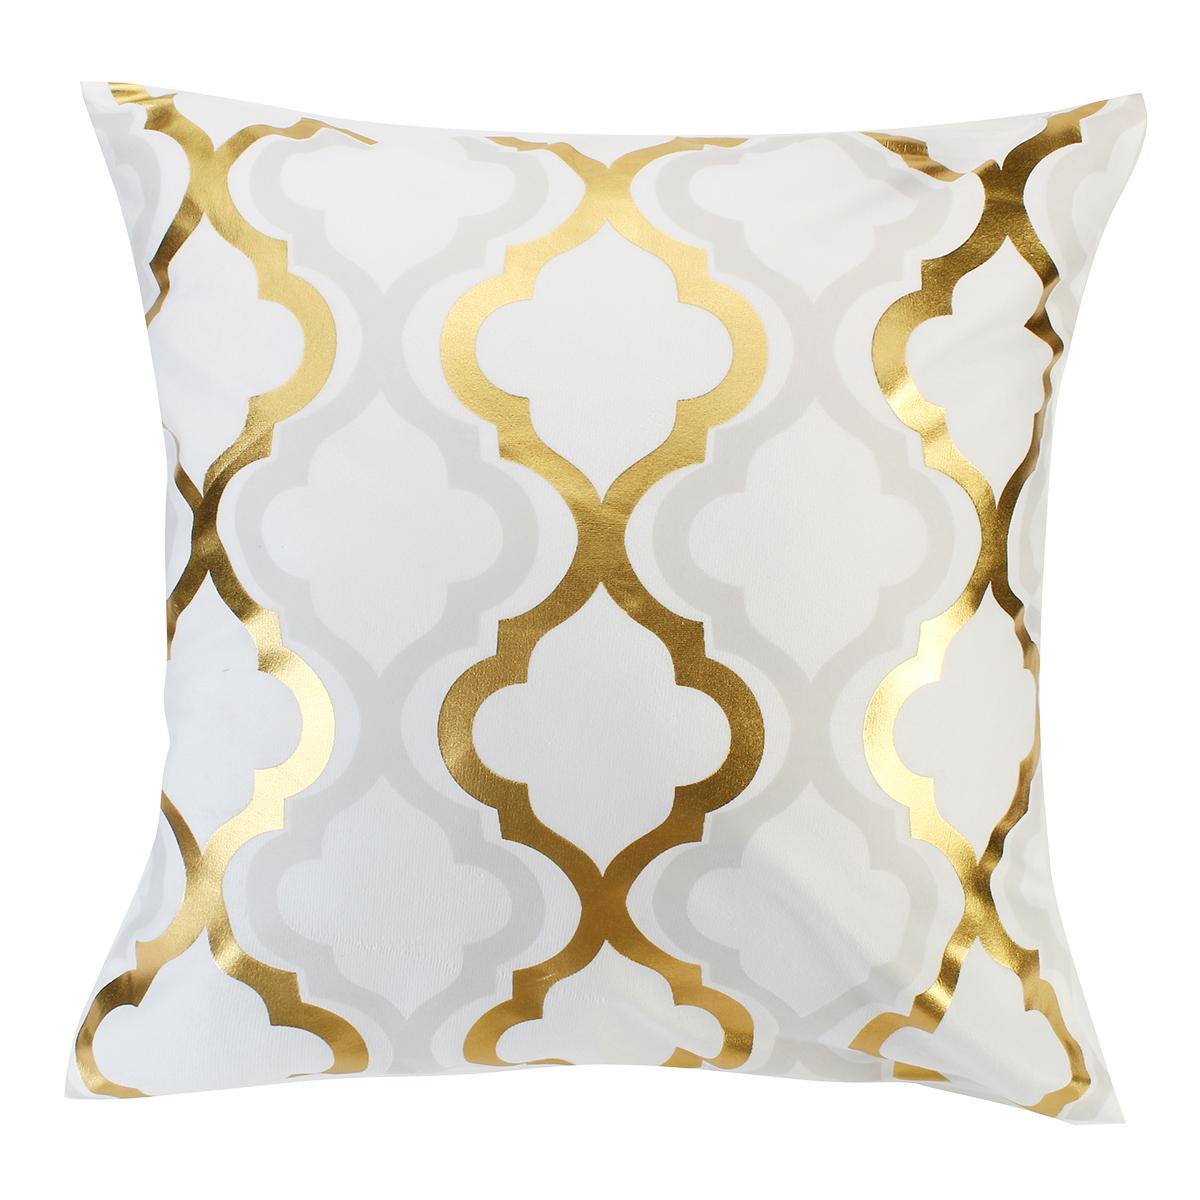 4 pillowcases 18 x 18 golden decorative cushion set pillowcase for sofa square pillow design office chair pillowcase bedroom study pillowcase